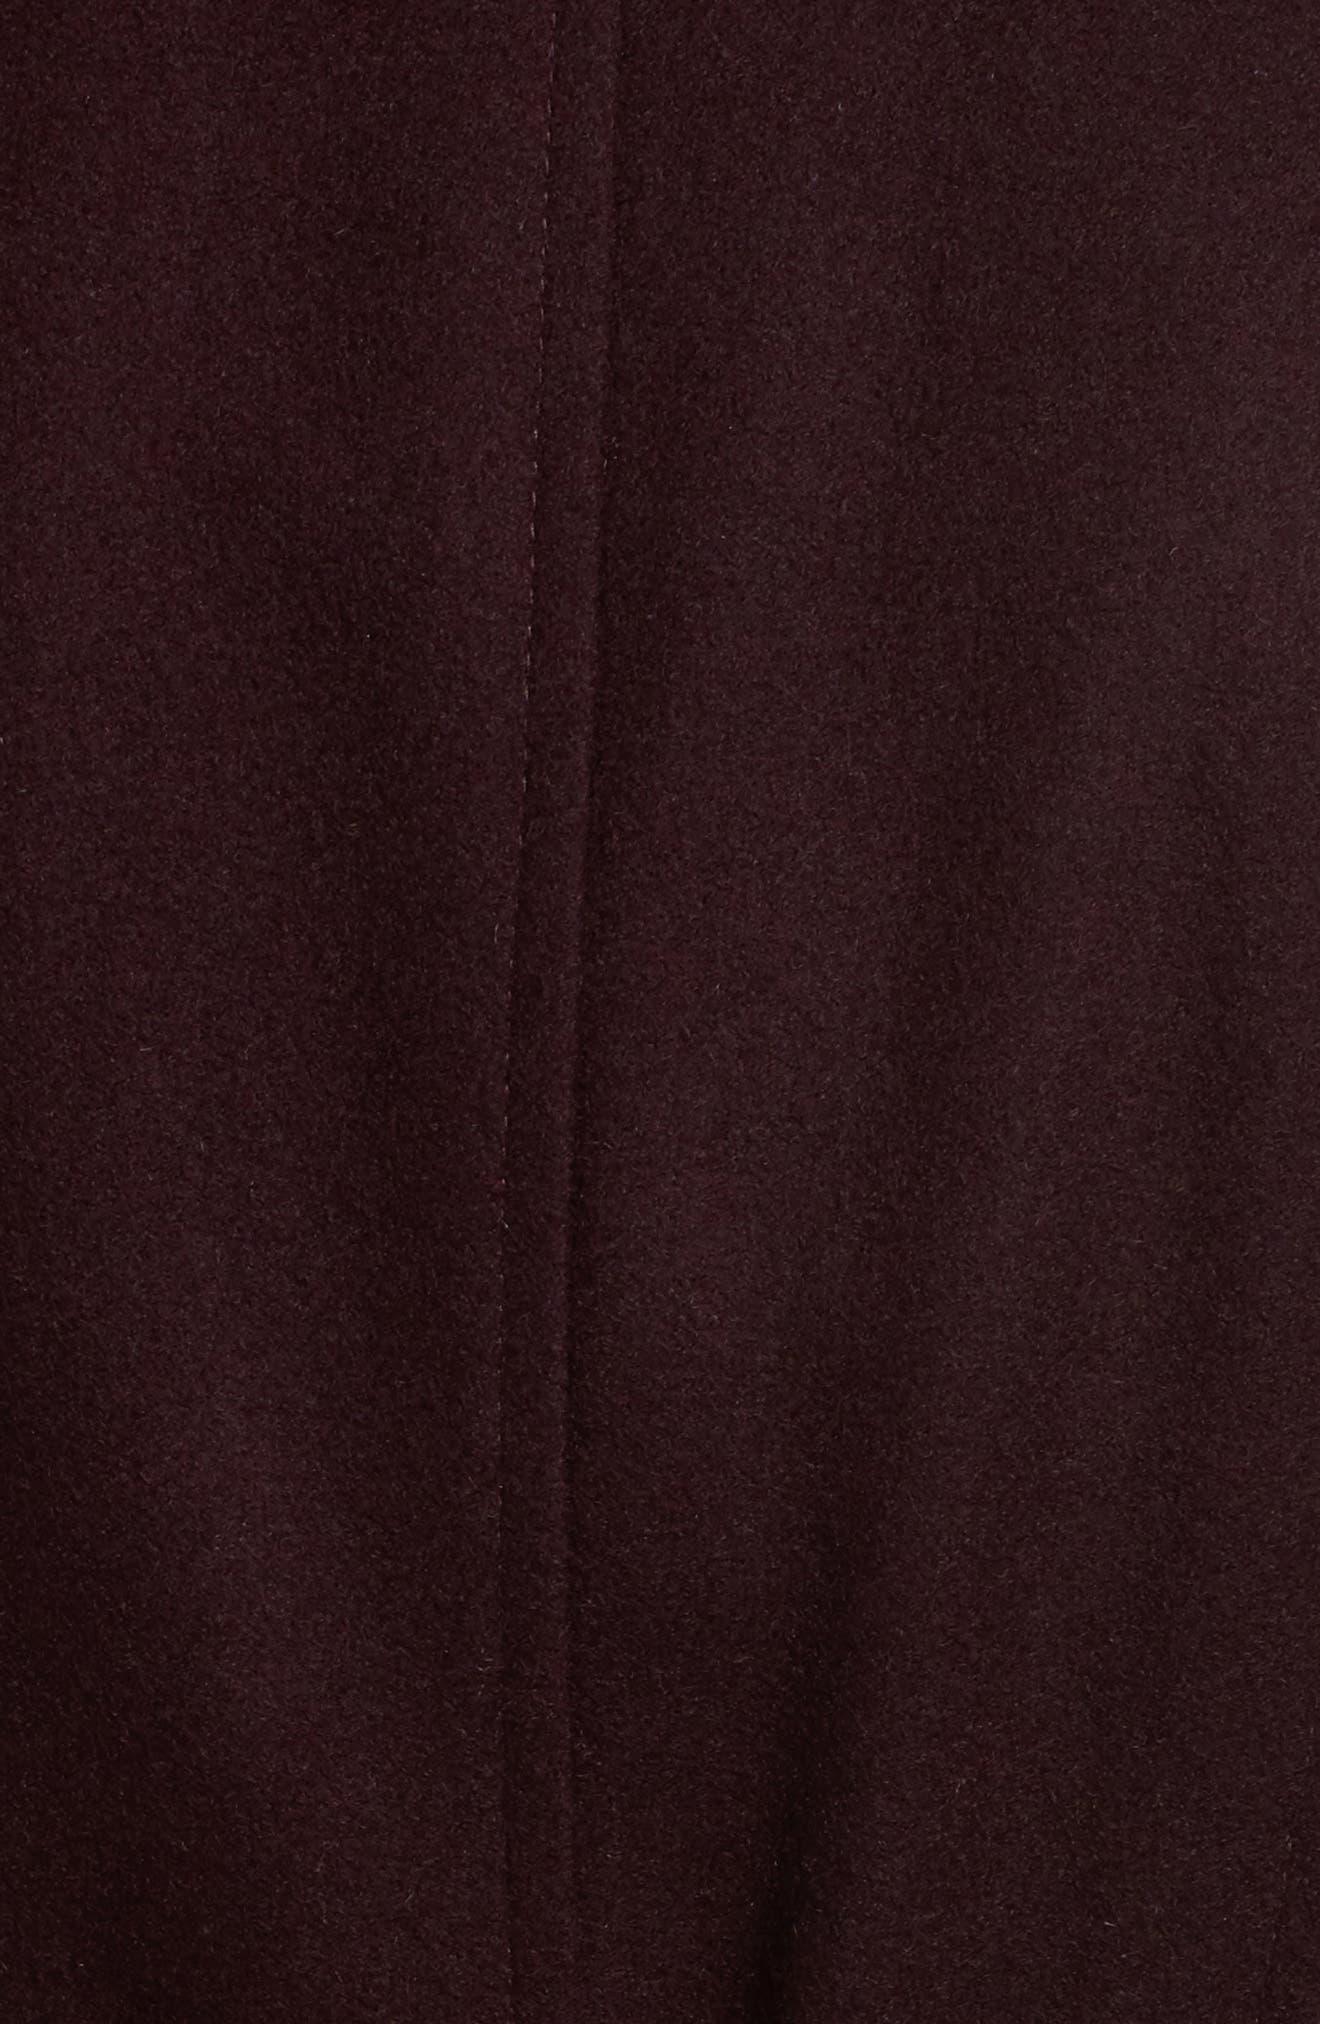 Faux Leather & Faux Fur Trim Belted Wool Blend Coat,                             Alternate thumbnail 41, color,